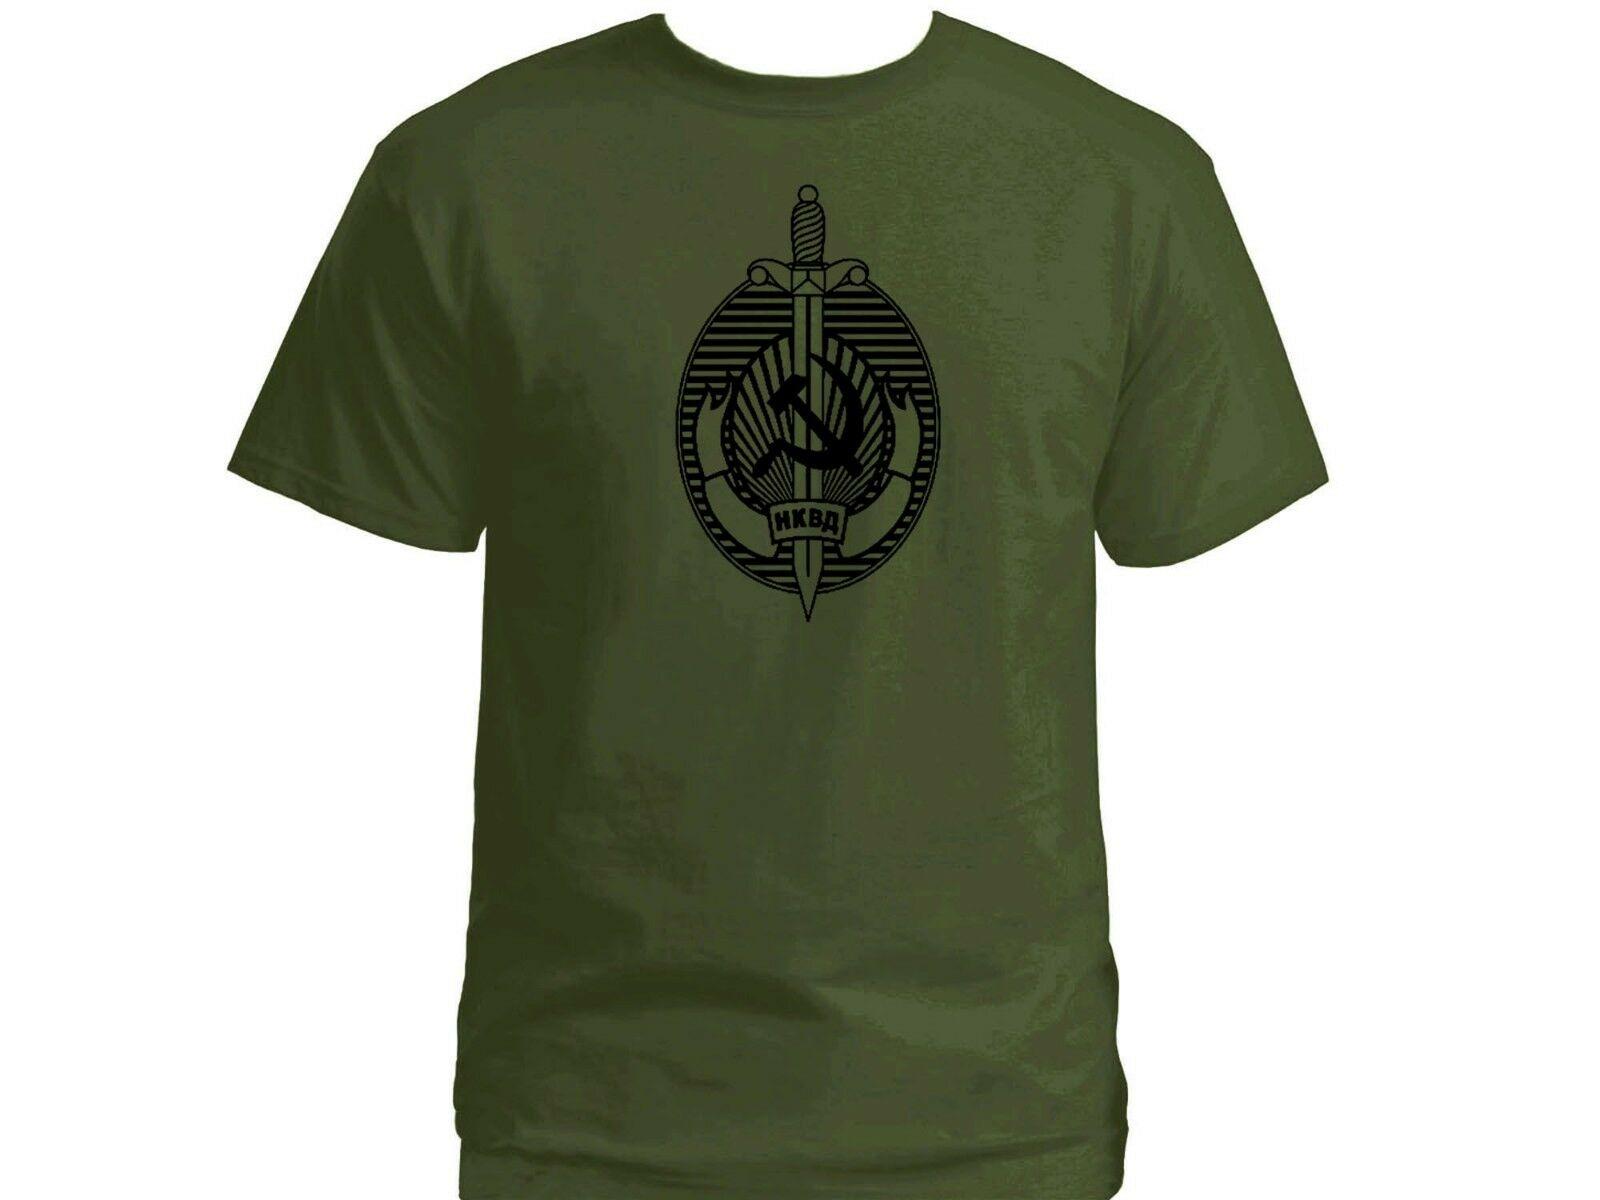 Мужская футболка с коротким рукавом, хлопковая рубашка с короткими рукавами, в русском стиле, NKVD, KGB